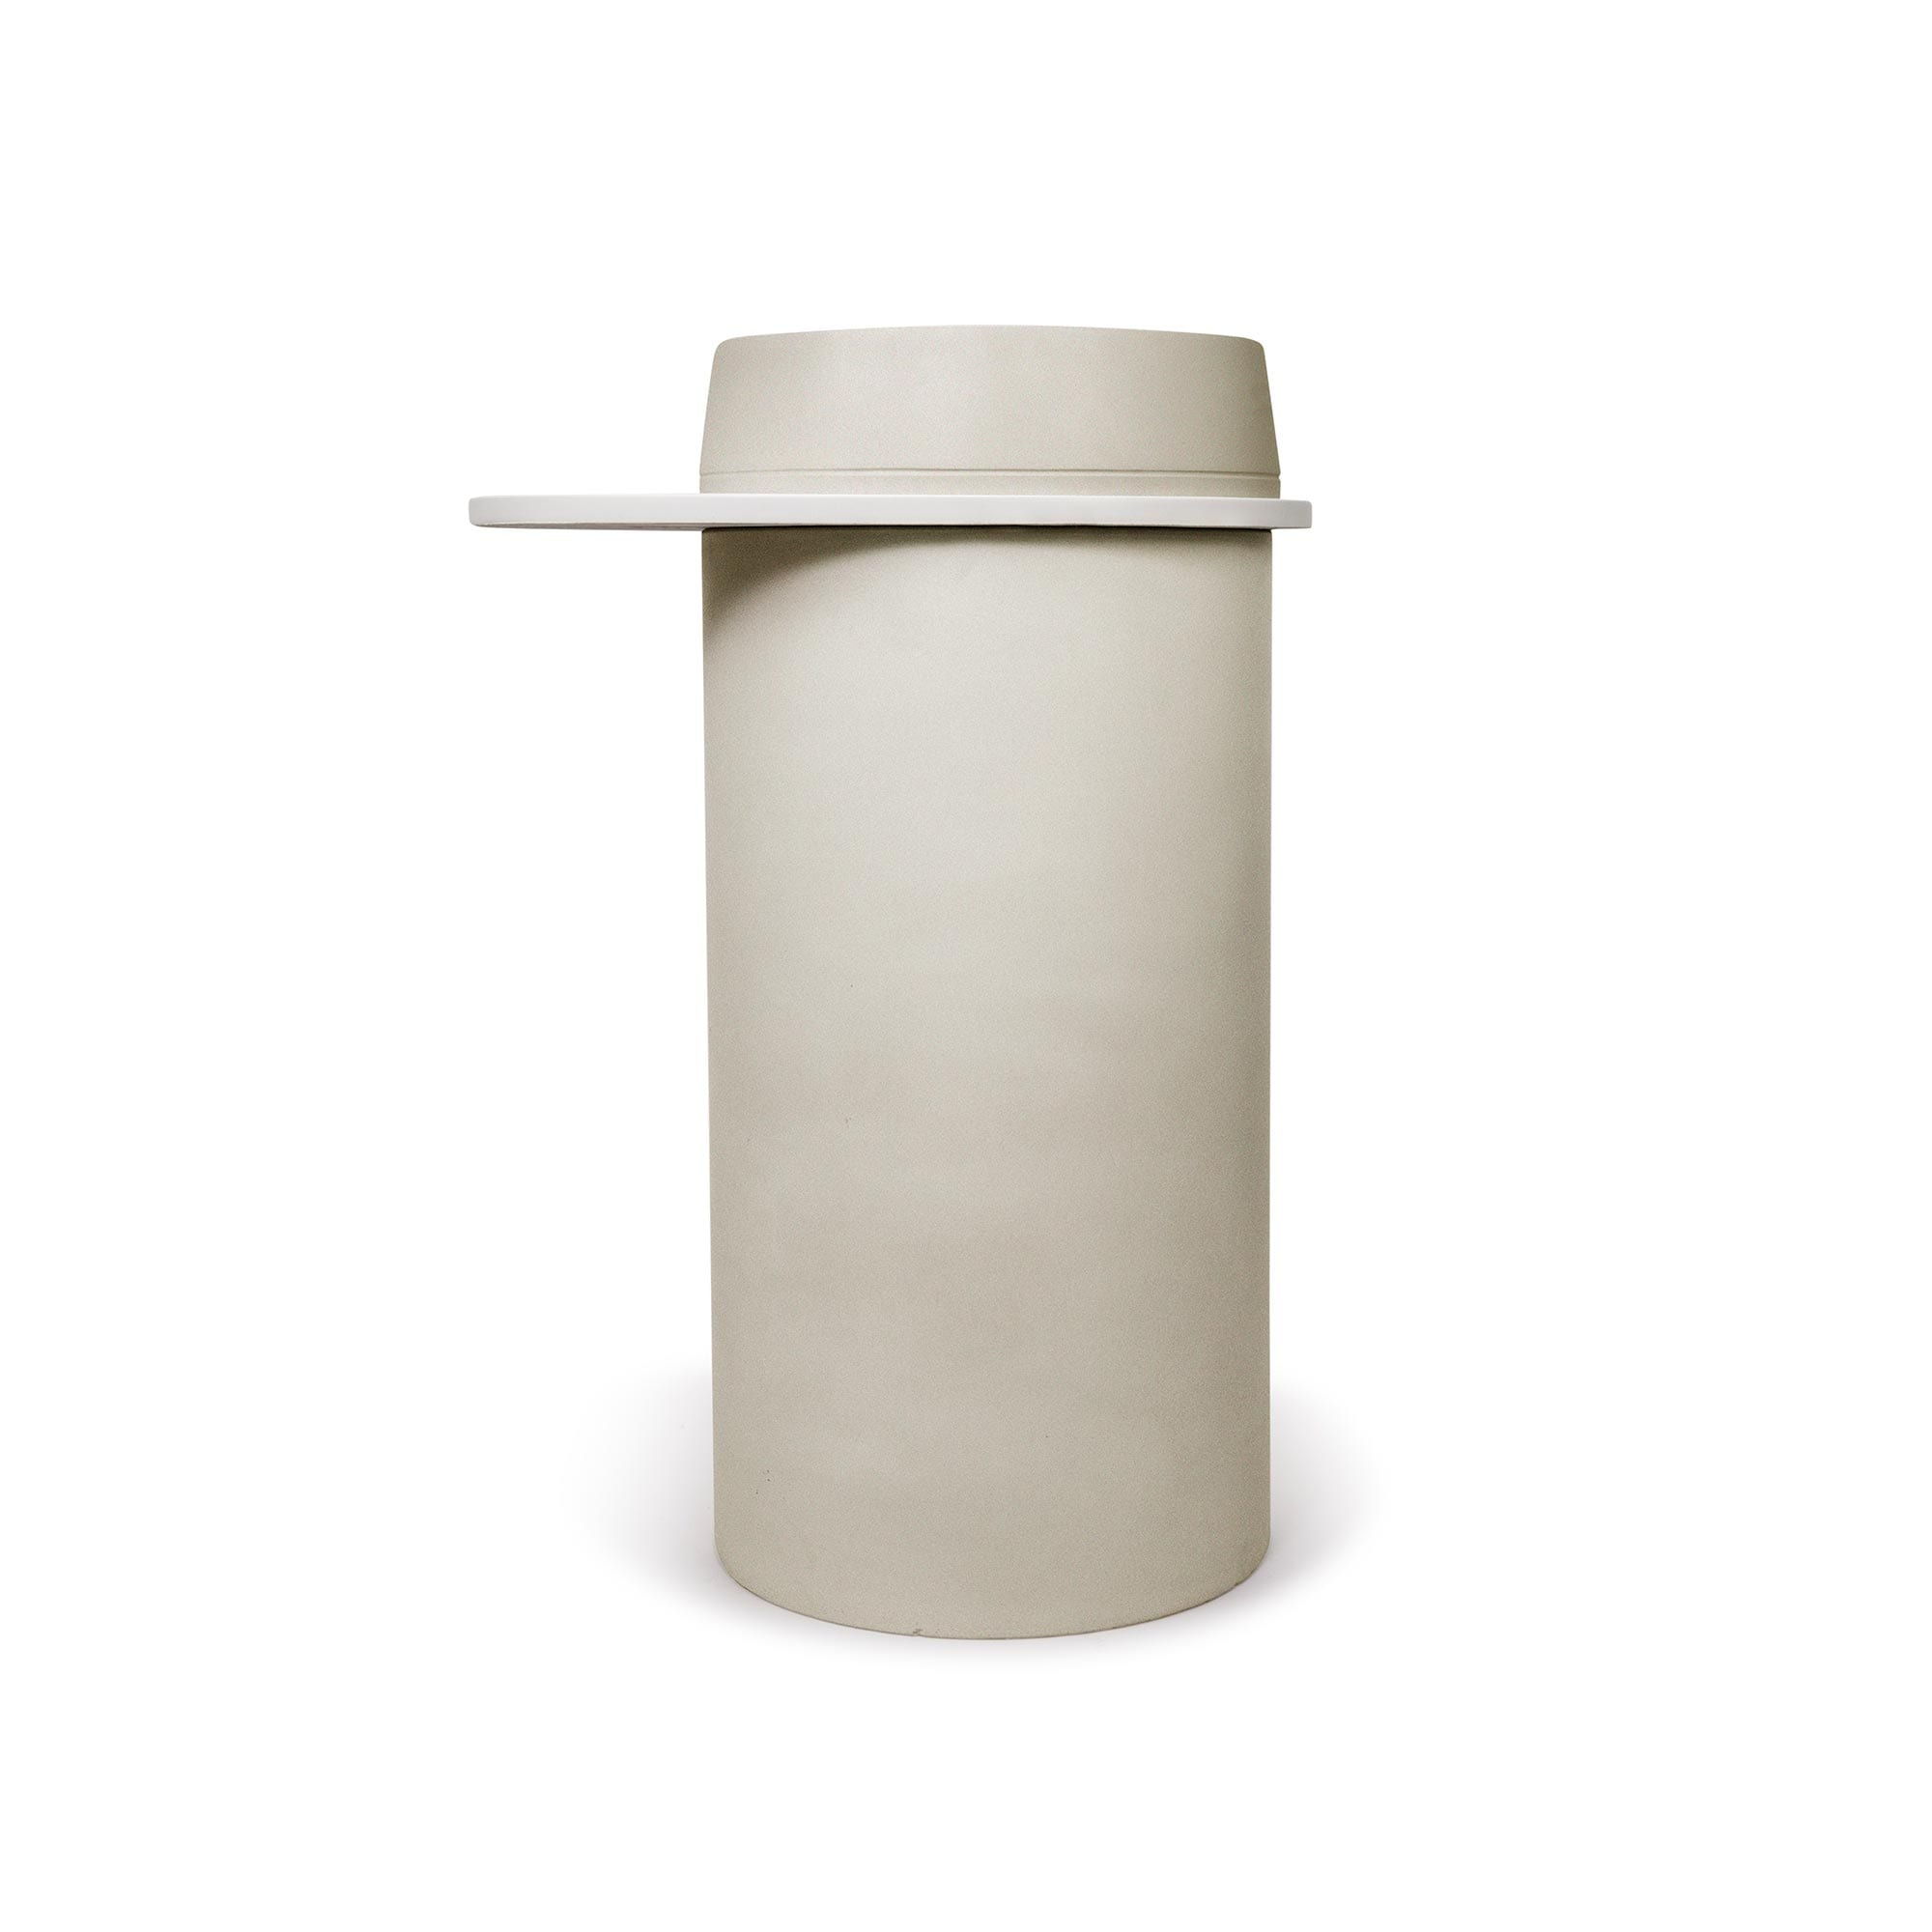 Funl Basin Cylinder 6